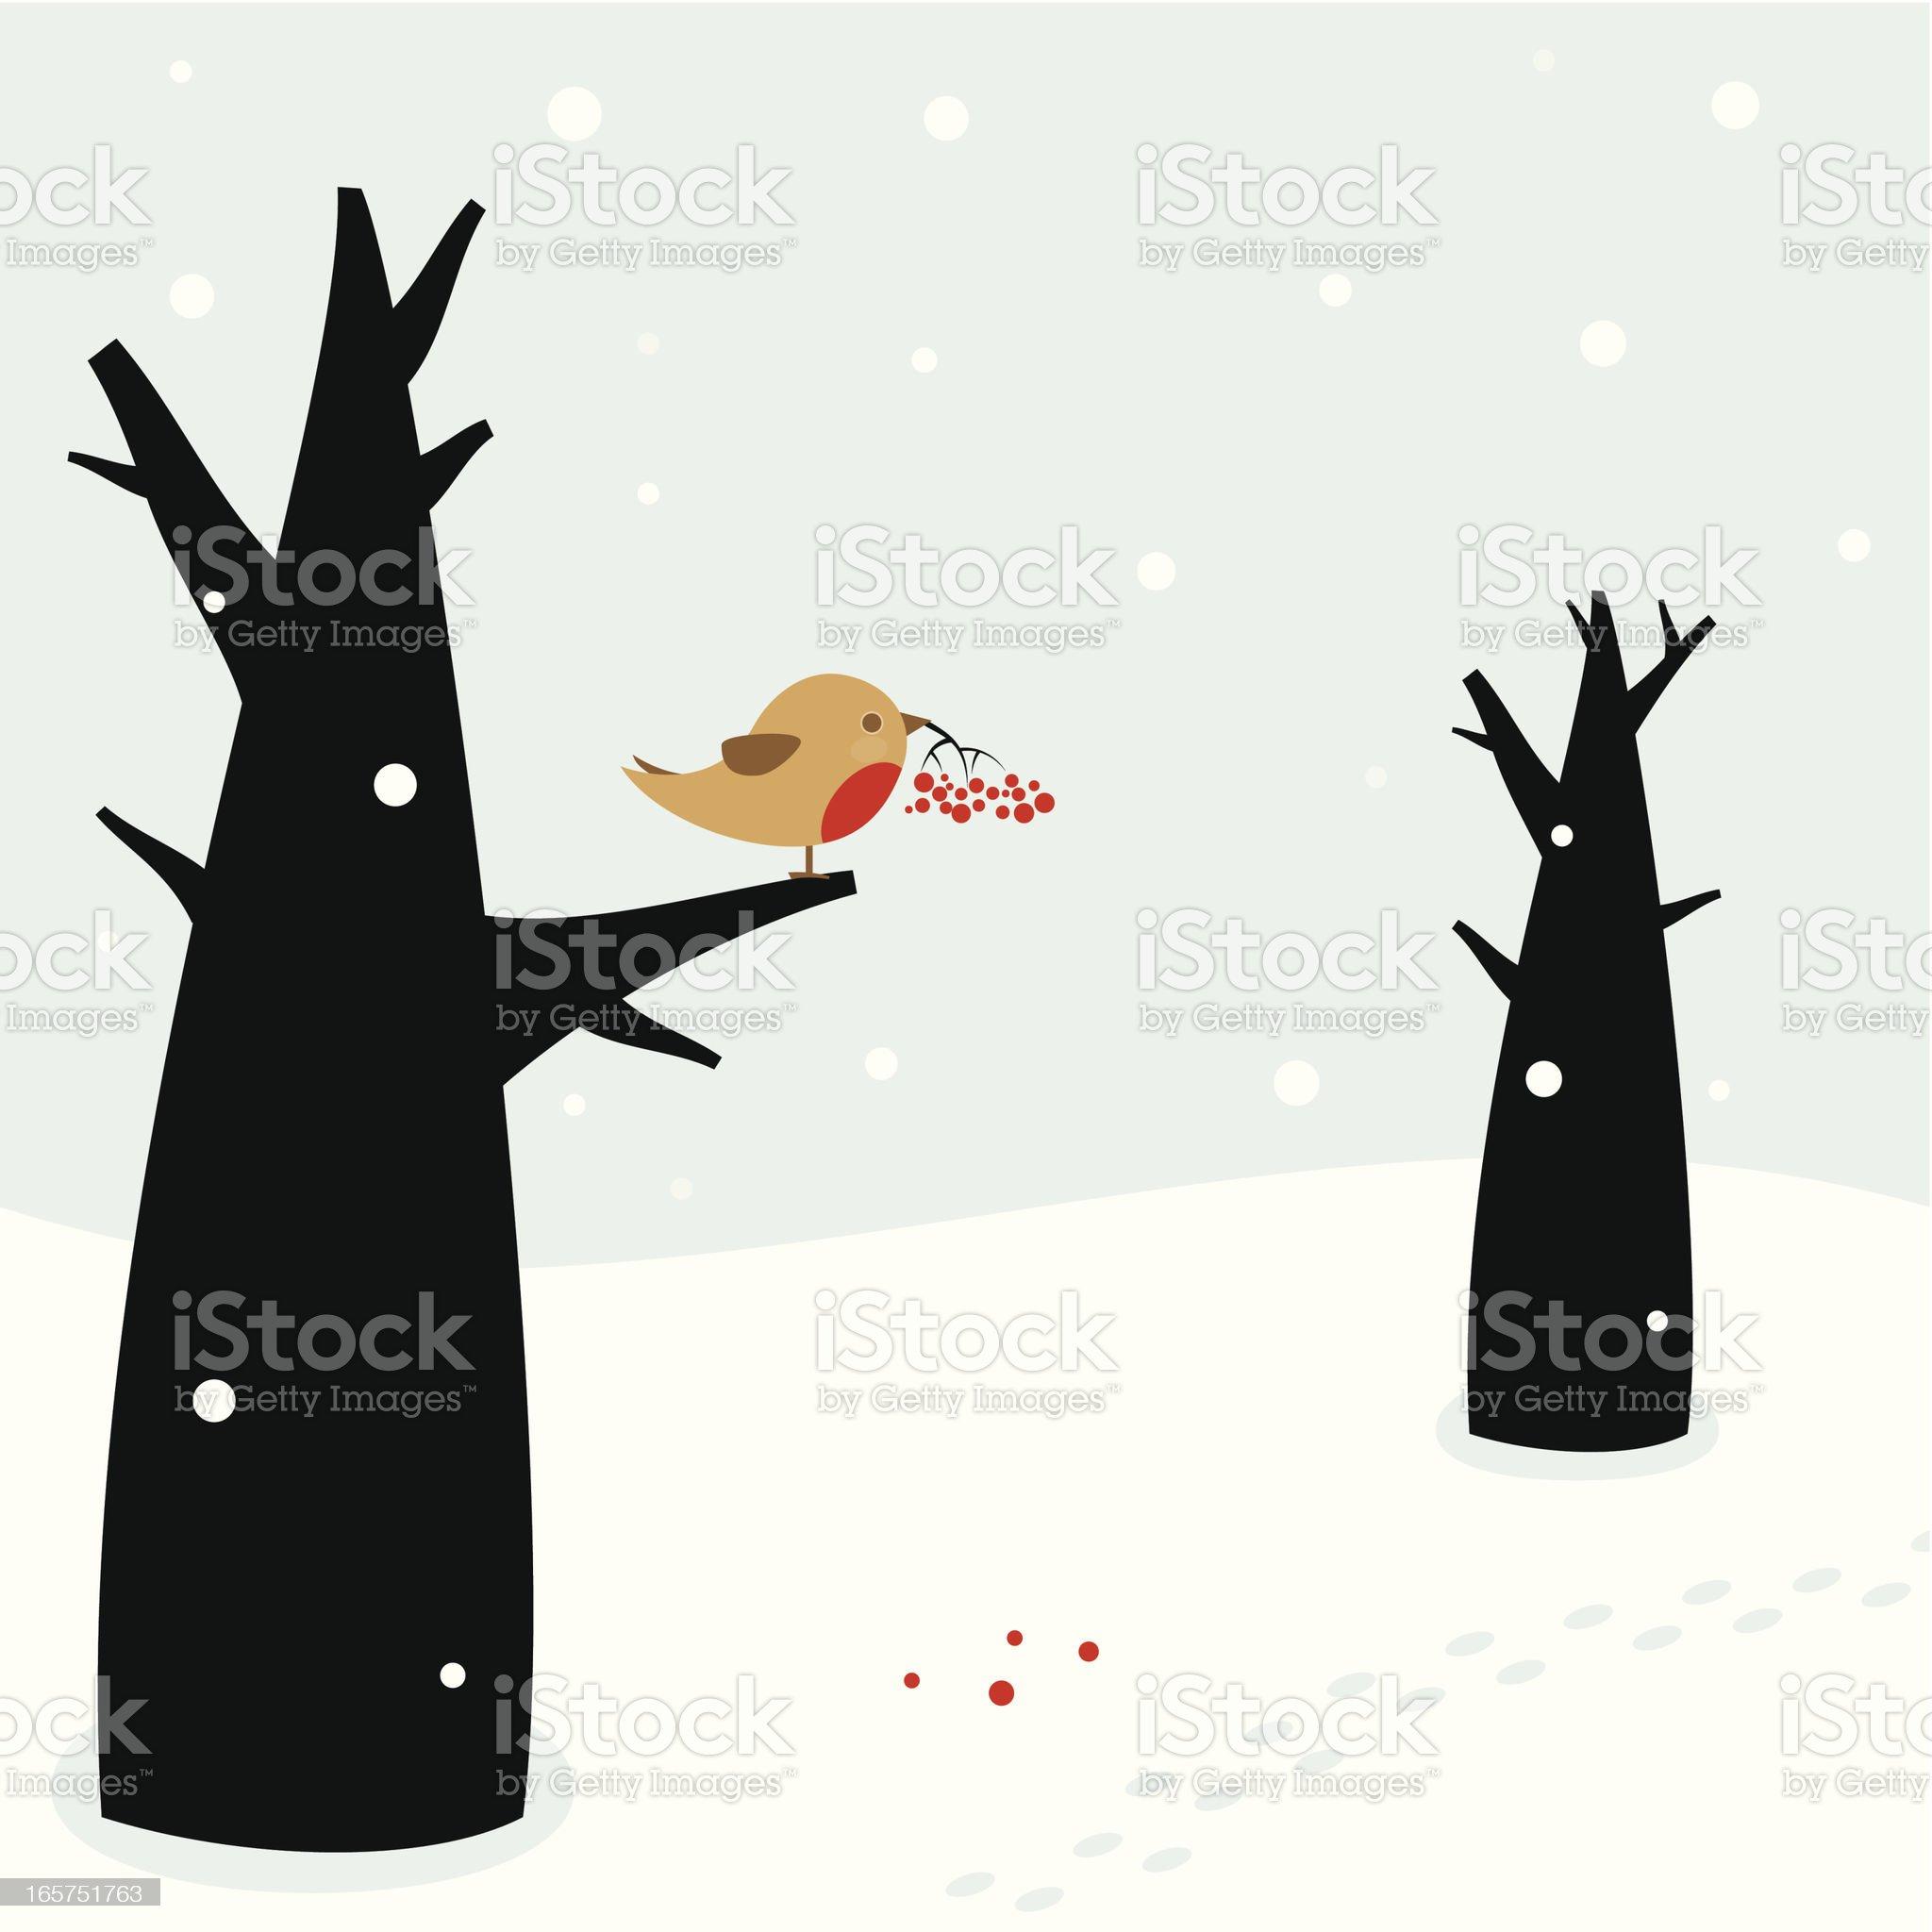 Elegiac christmas royalty-free stock vector art